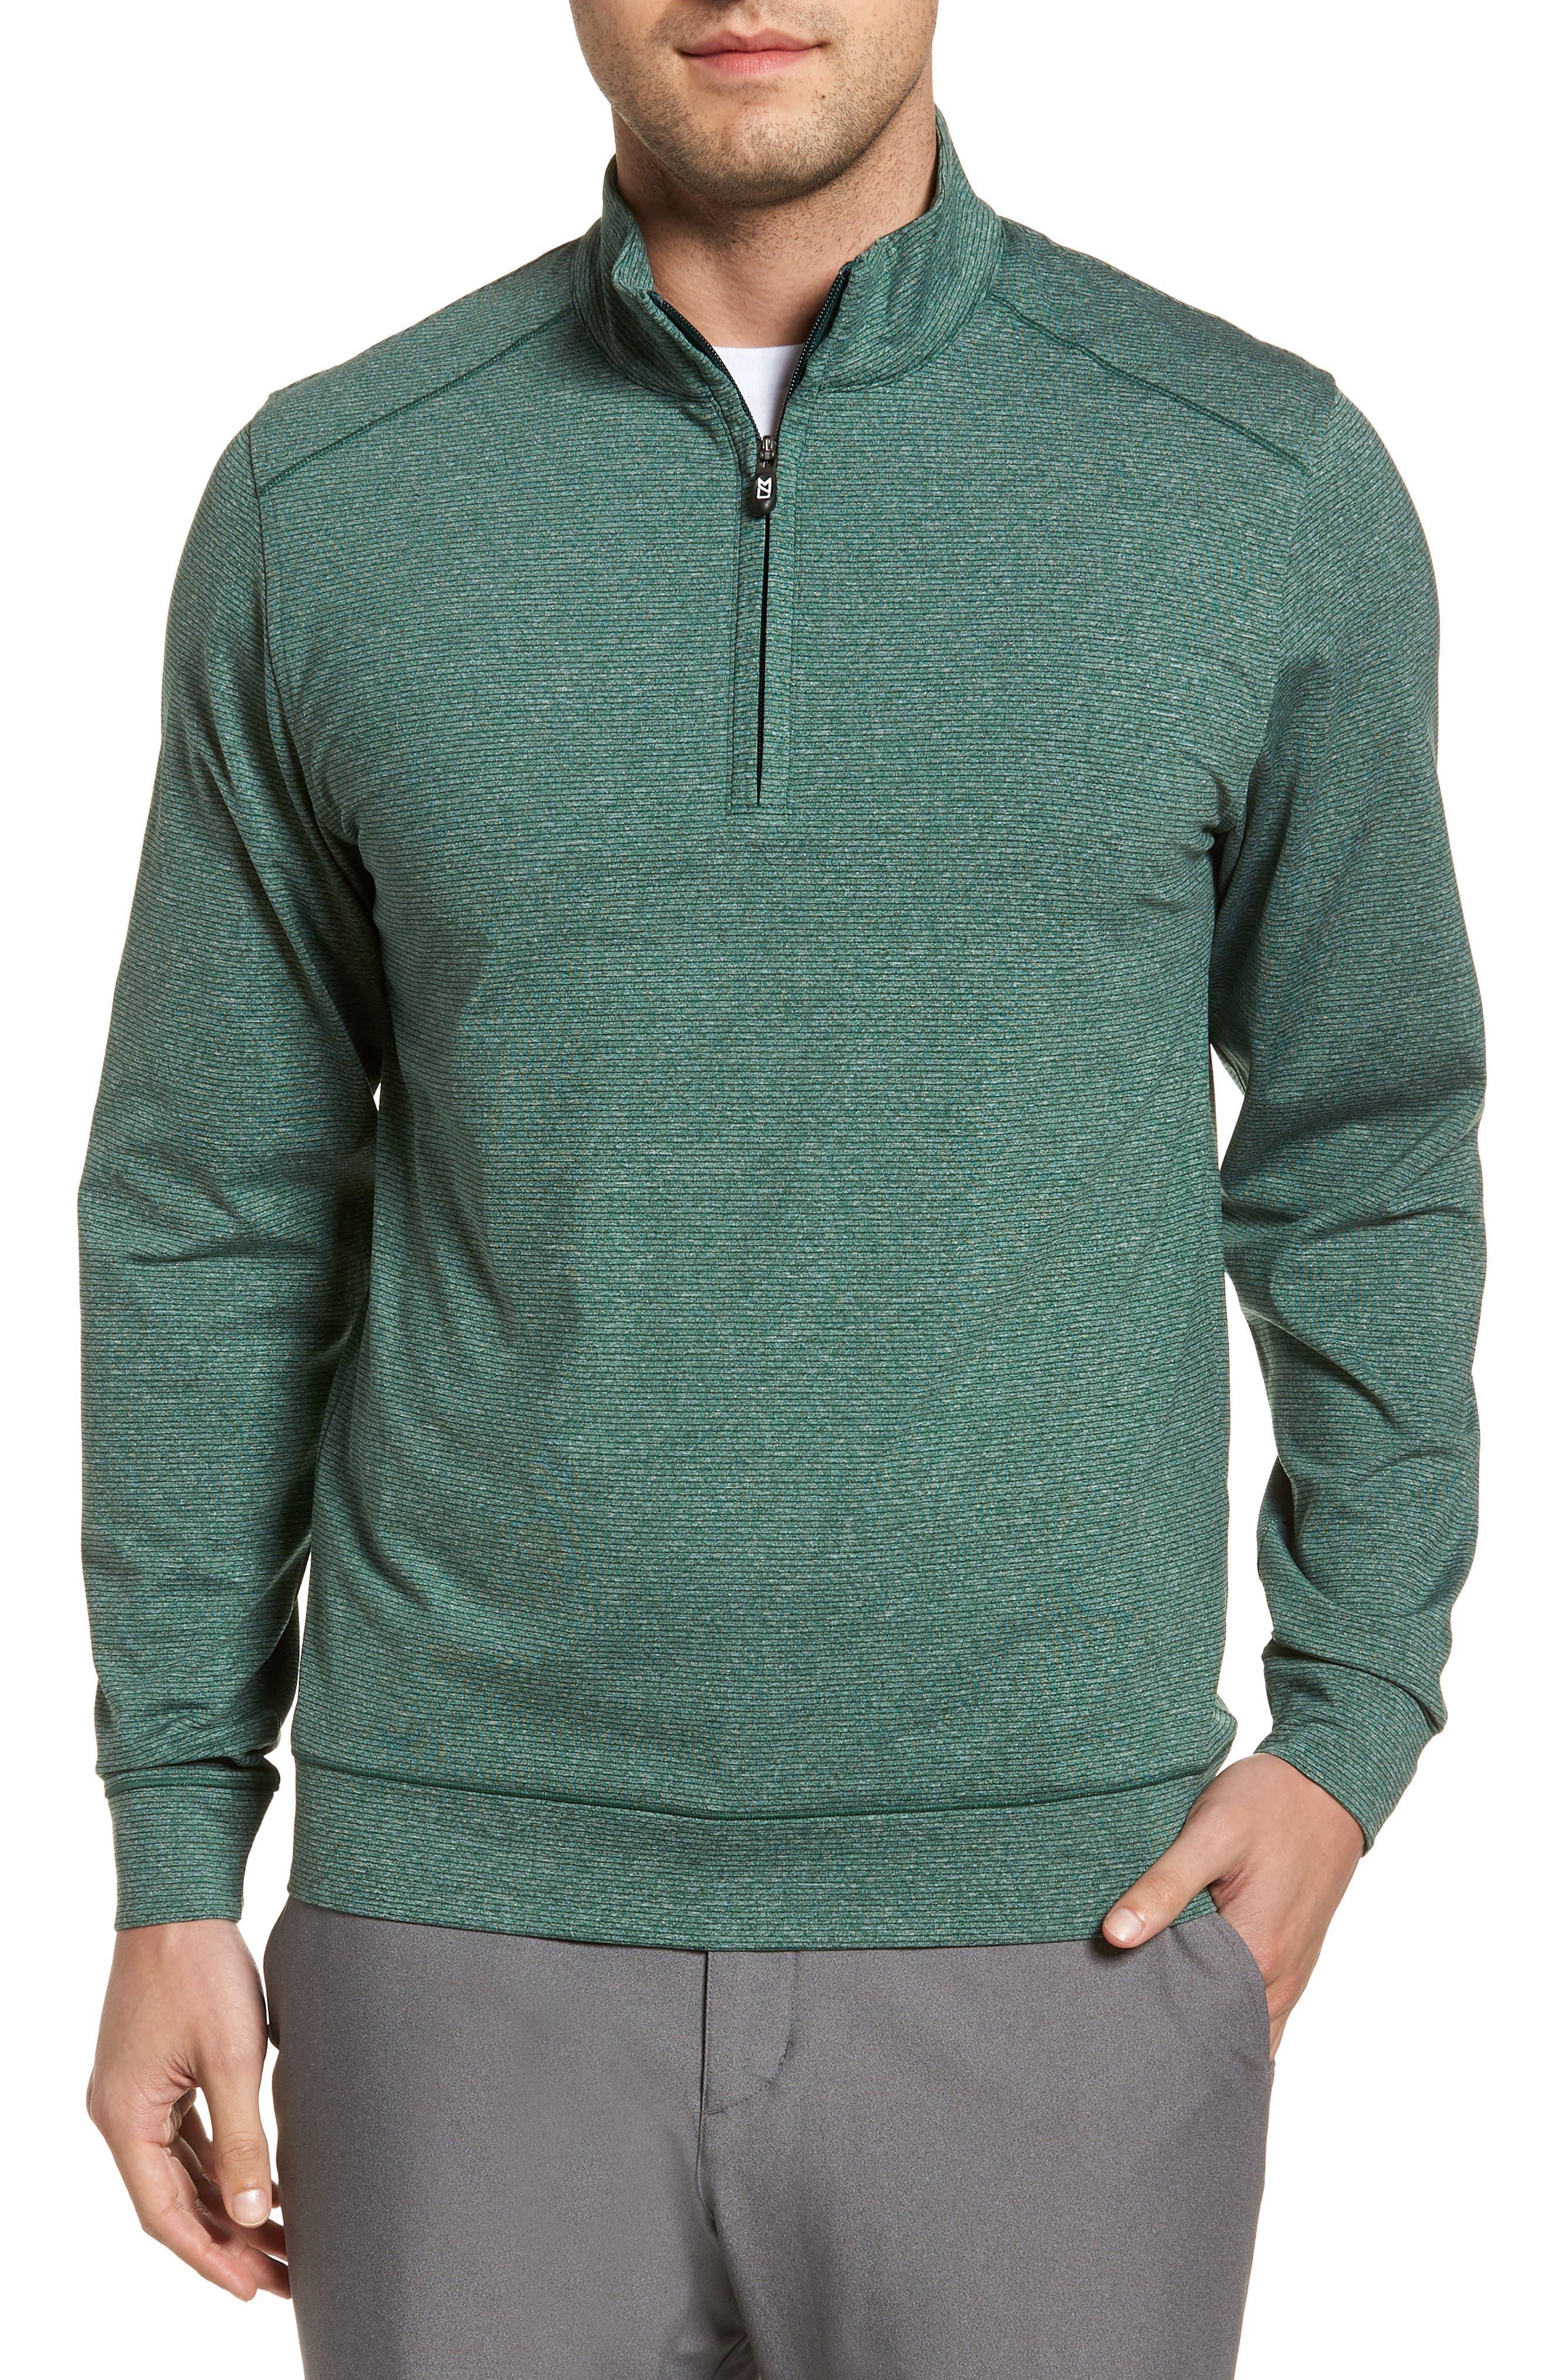 CUTTER & BUCK, Shoreline Classic Fit Half Zip Pullover, Main thumbnail 1, color, HUNTER HEATHER